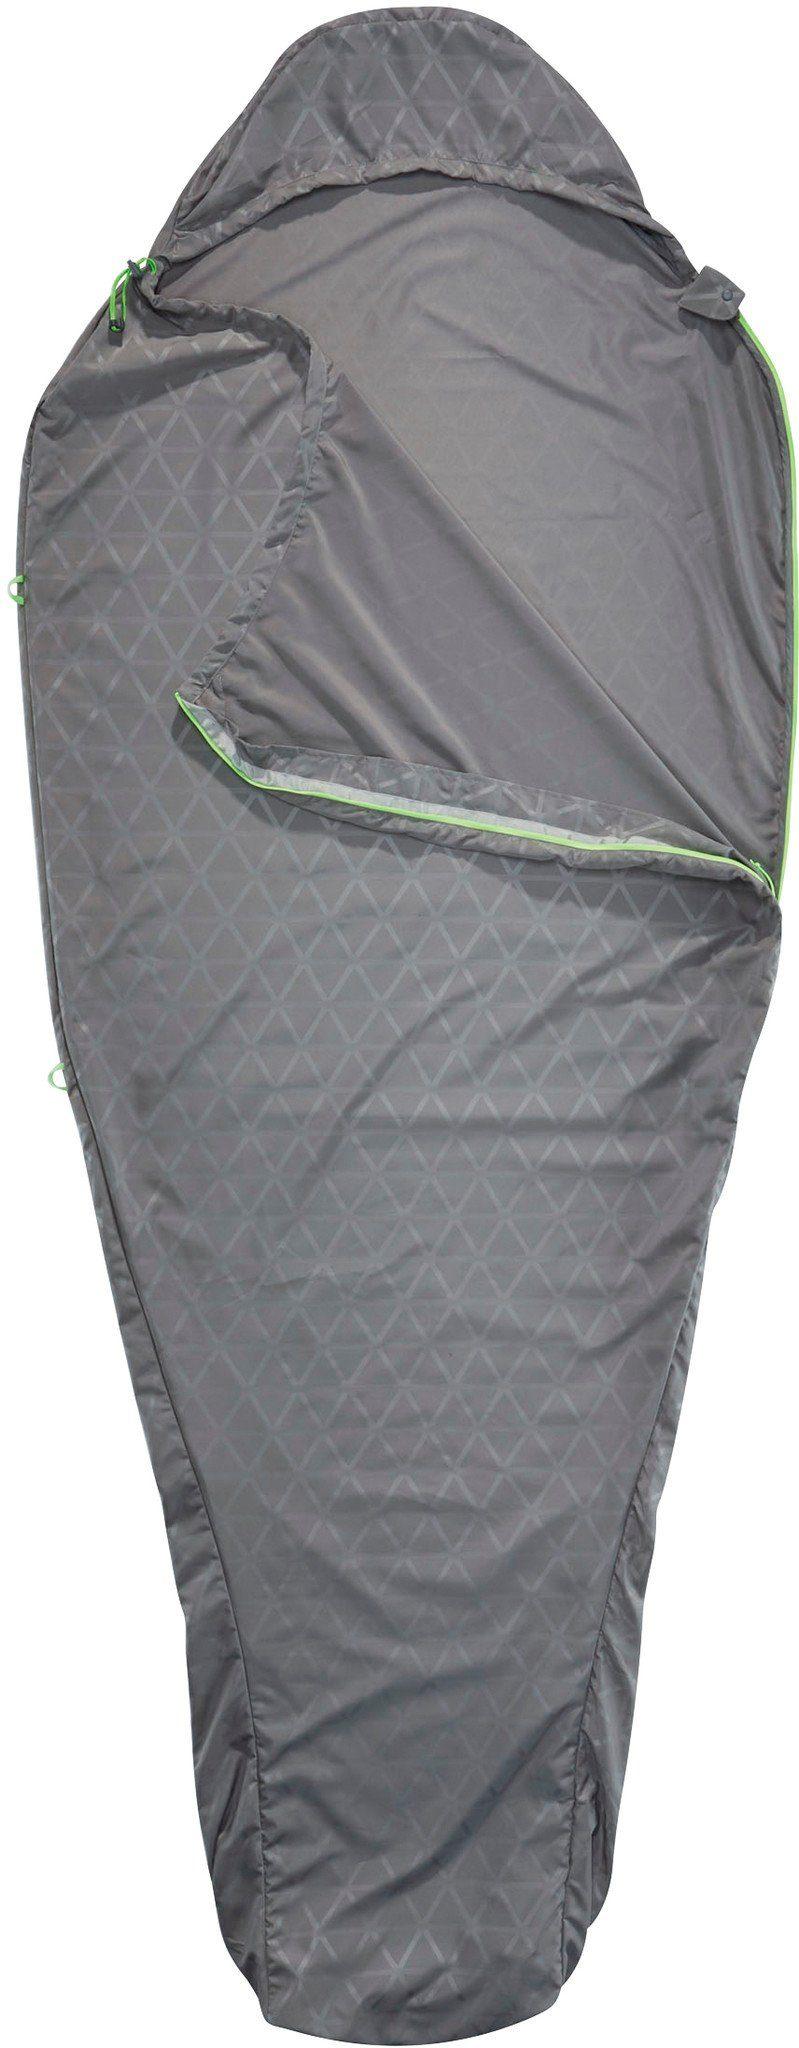 Therm-A-Rest Schlafsack »SleepLiner Sleeping Bag Small«